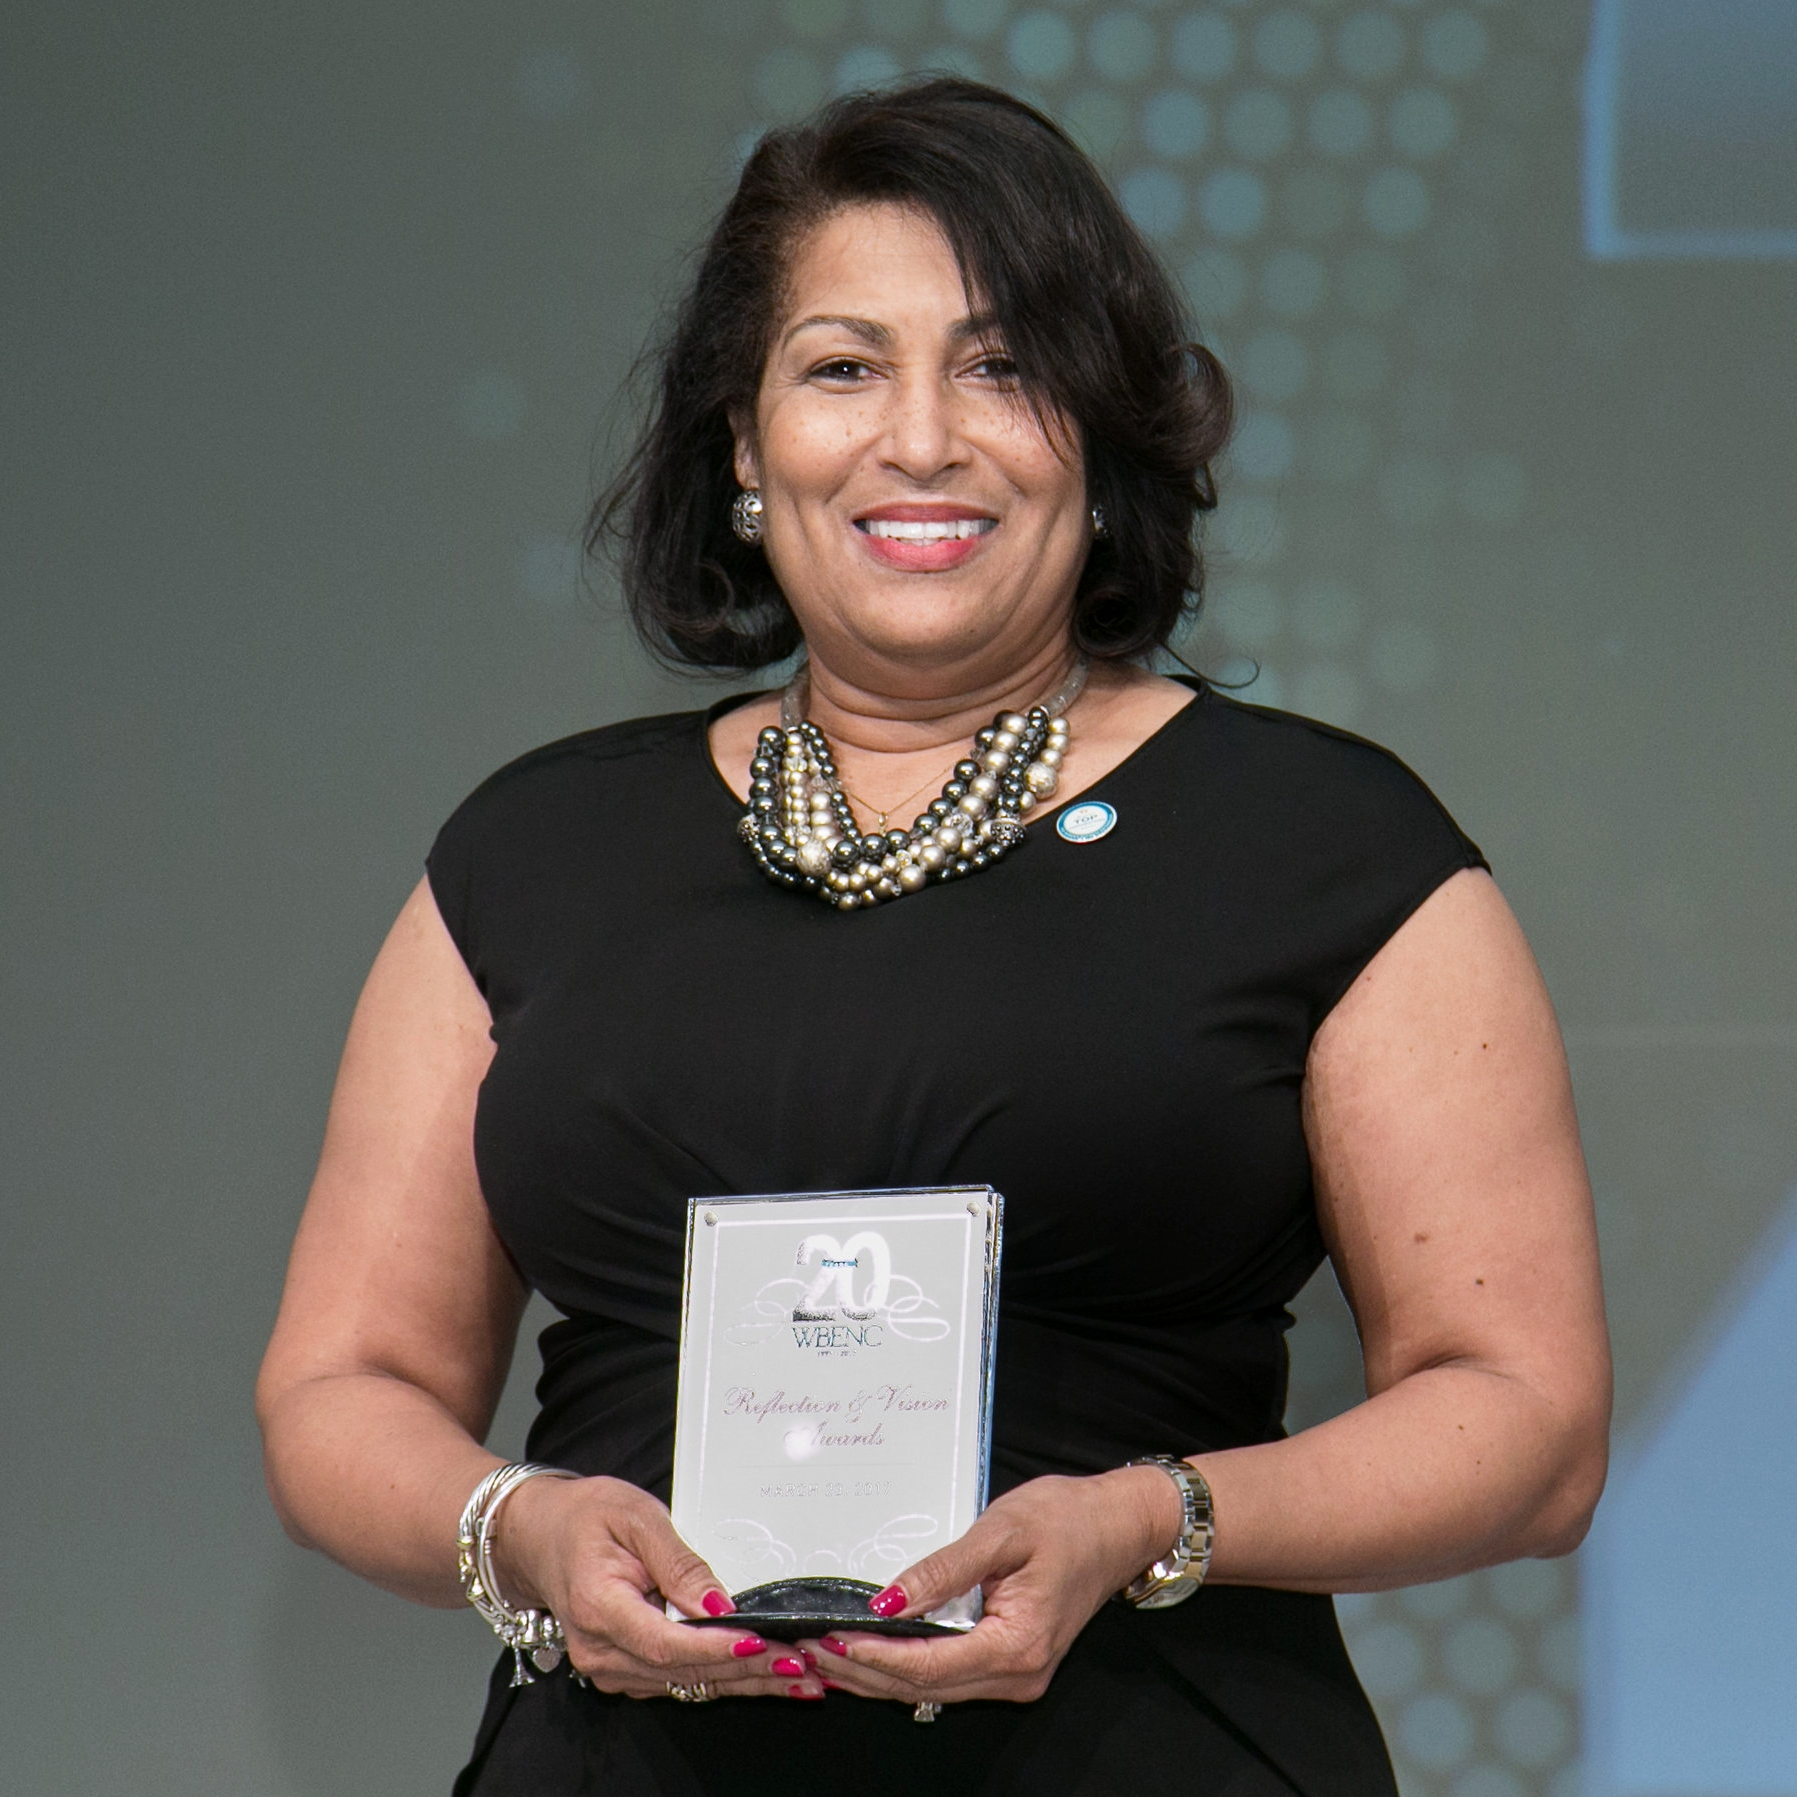 Debra Jennings-Johnson - Senior Director, Supplier Diversity of BP America, Inc.